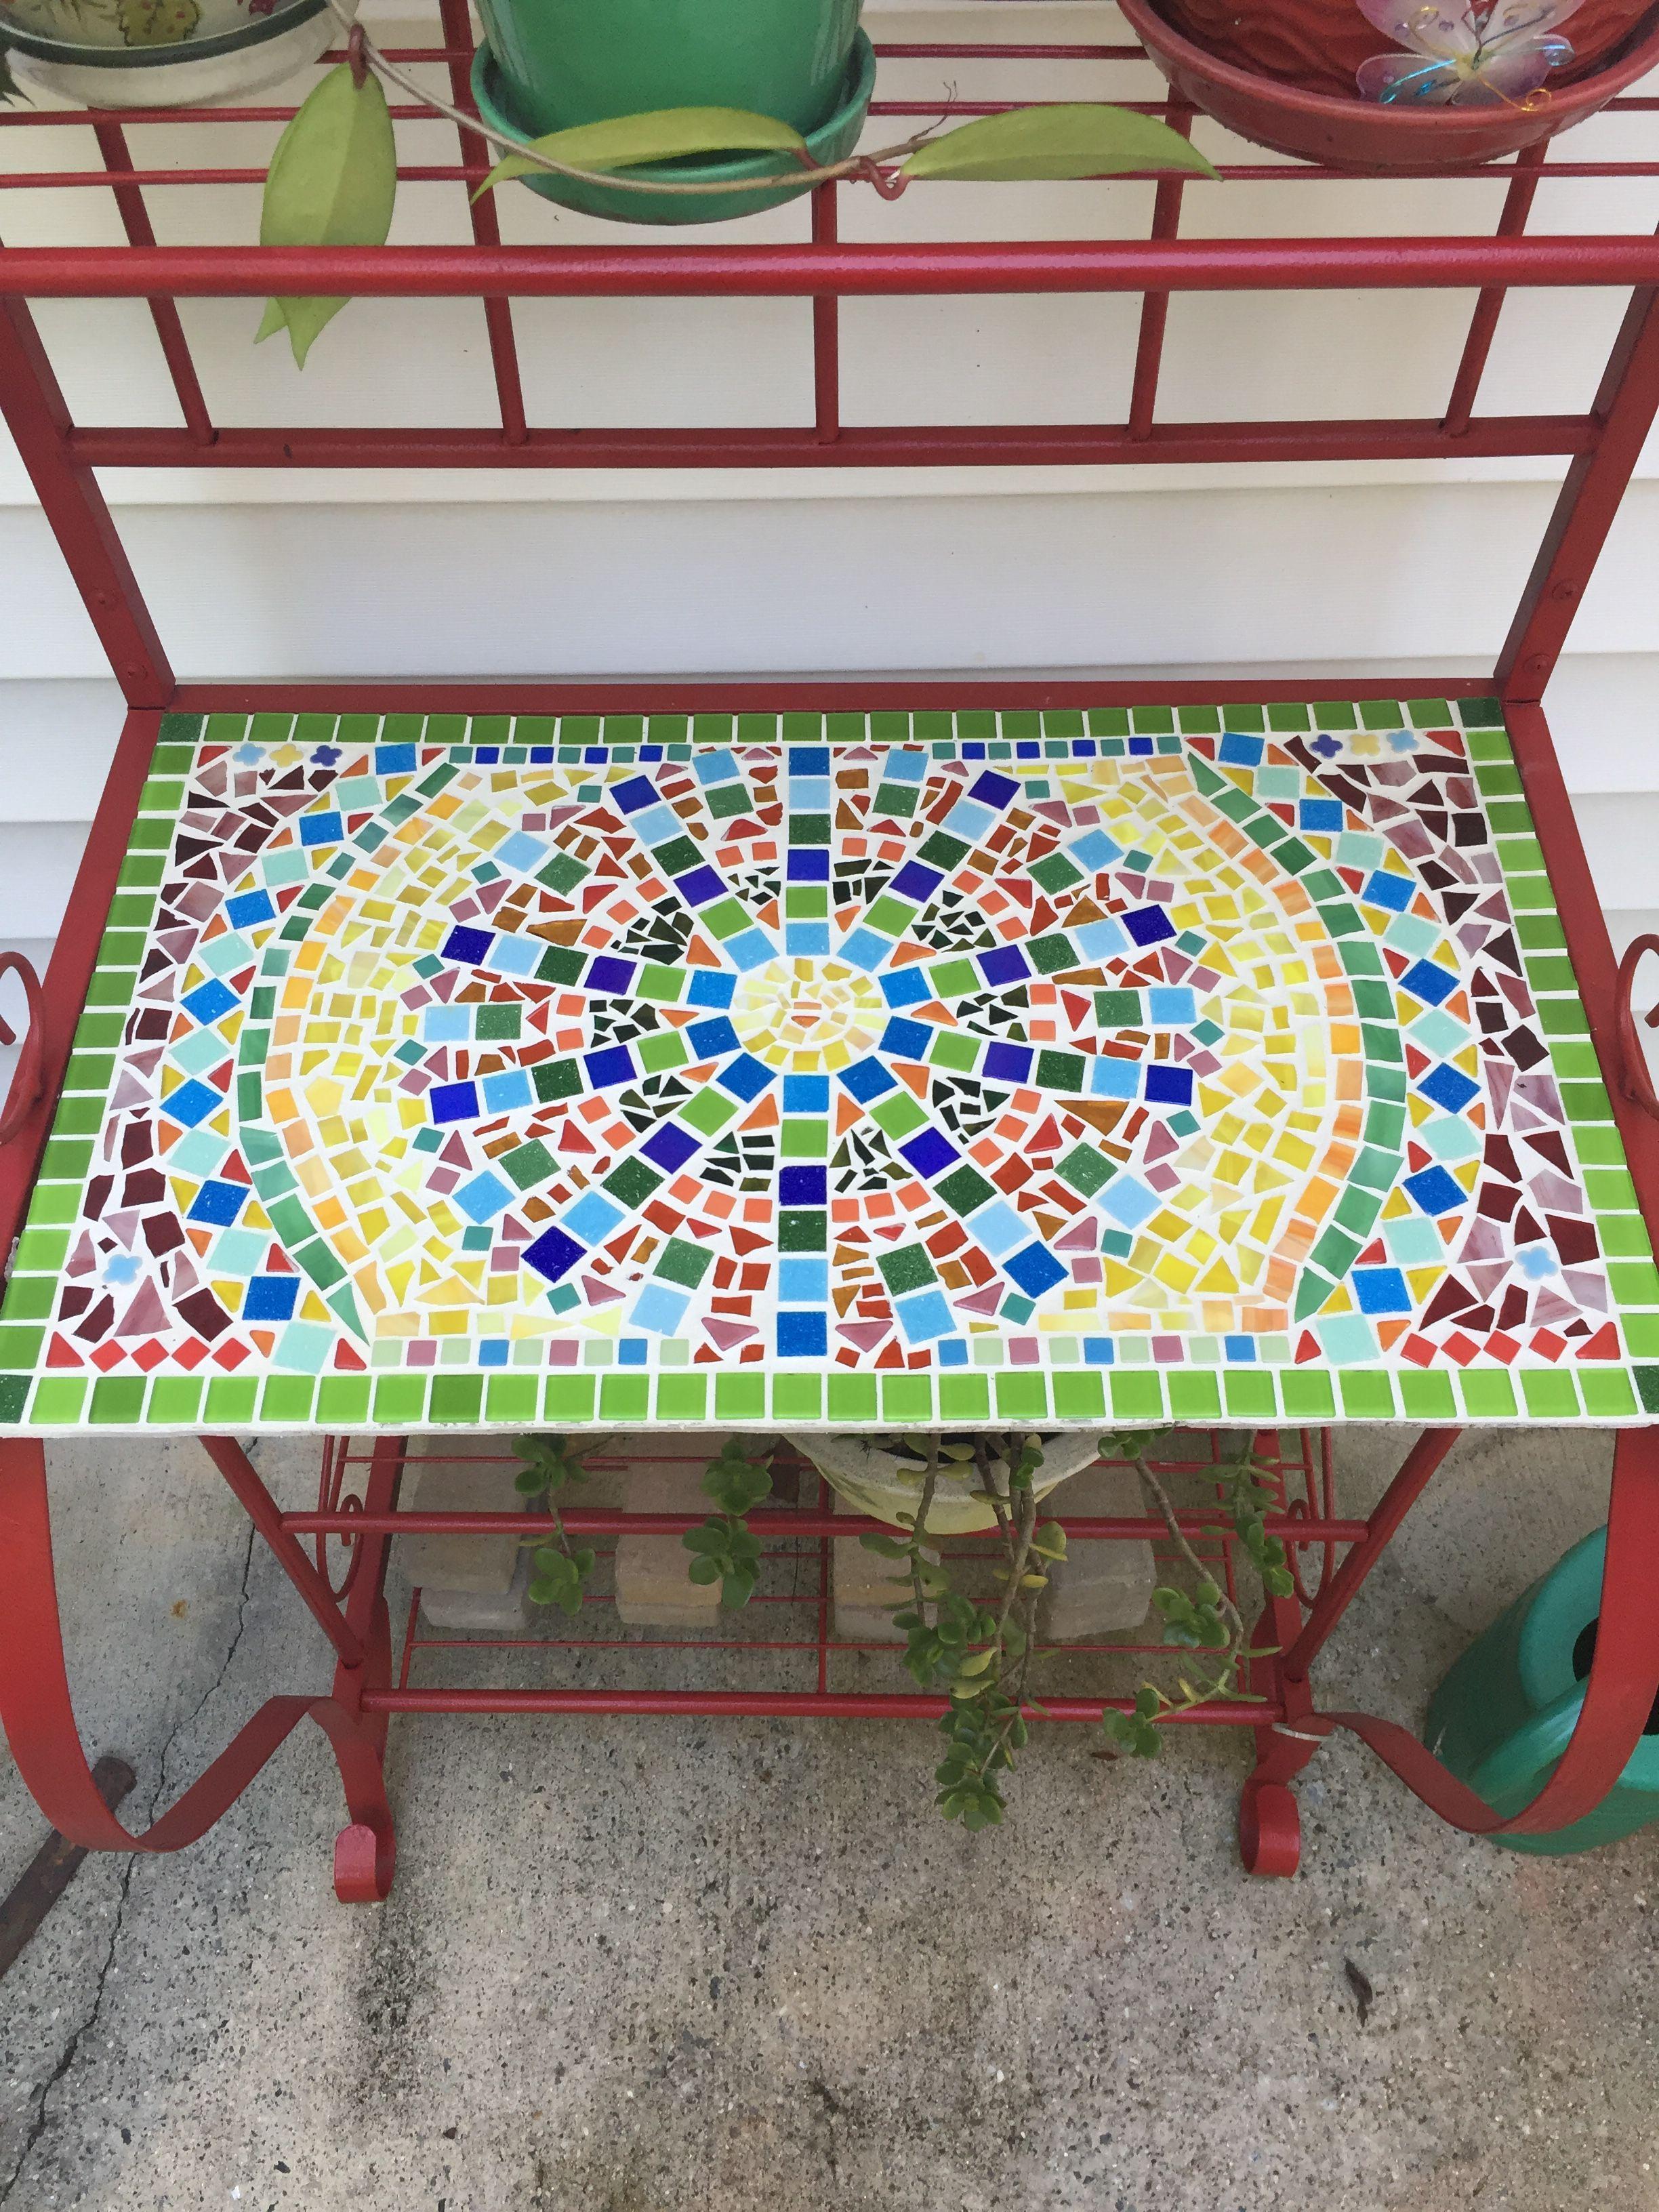 Mosaic Shelf For A Bakers Rack Mosaic Table Mosaic Decor